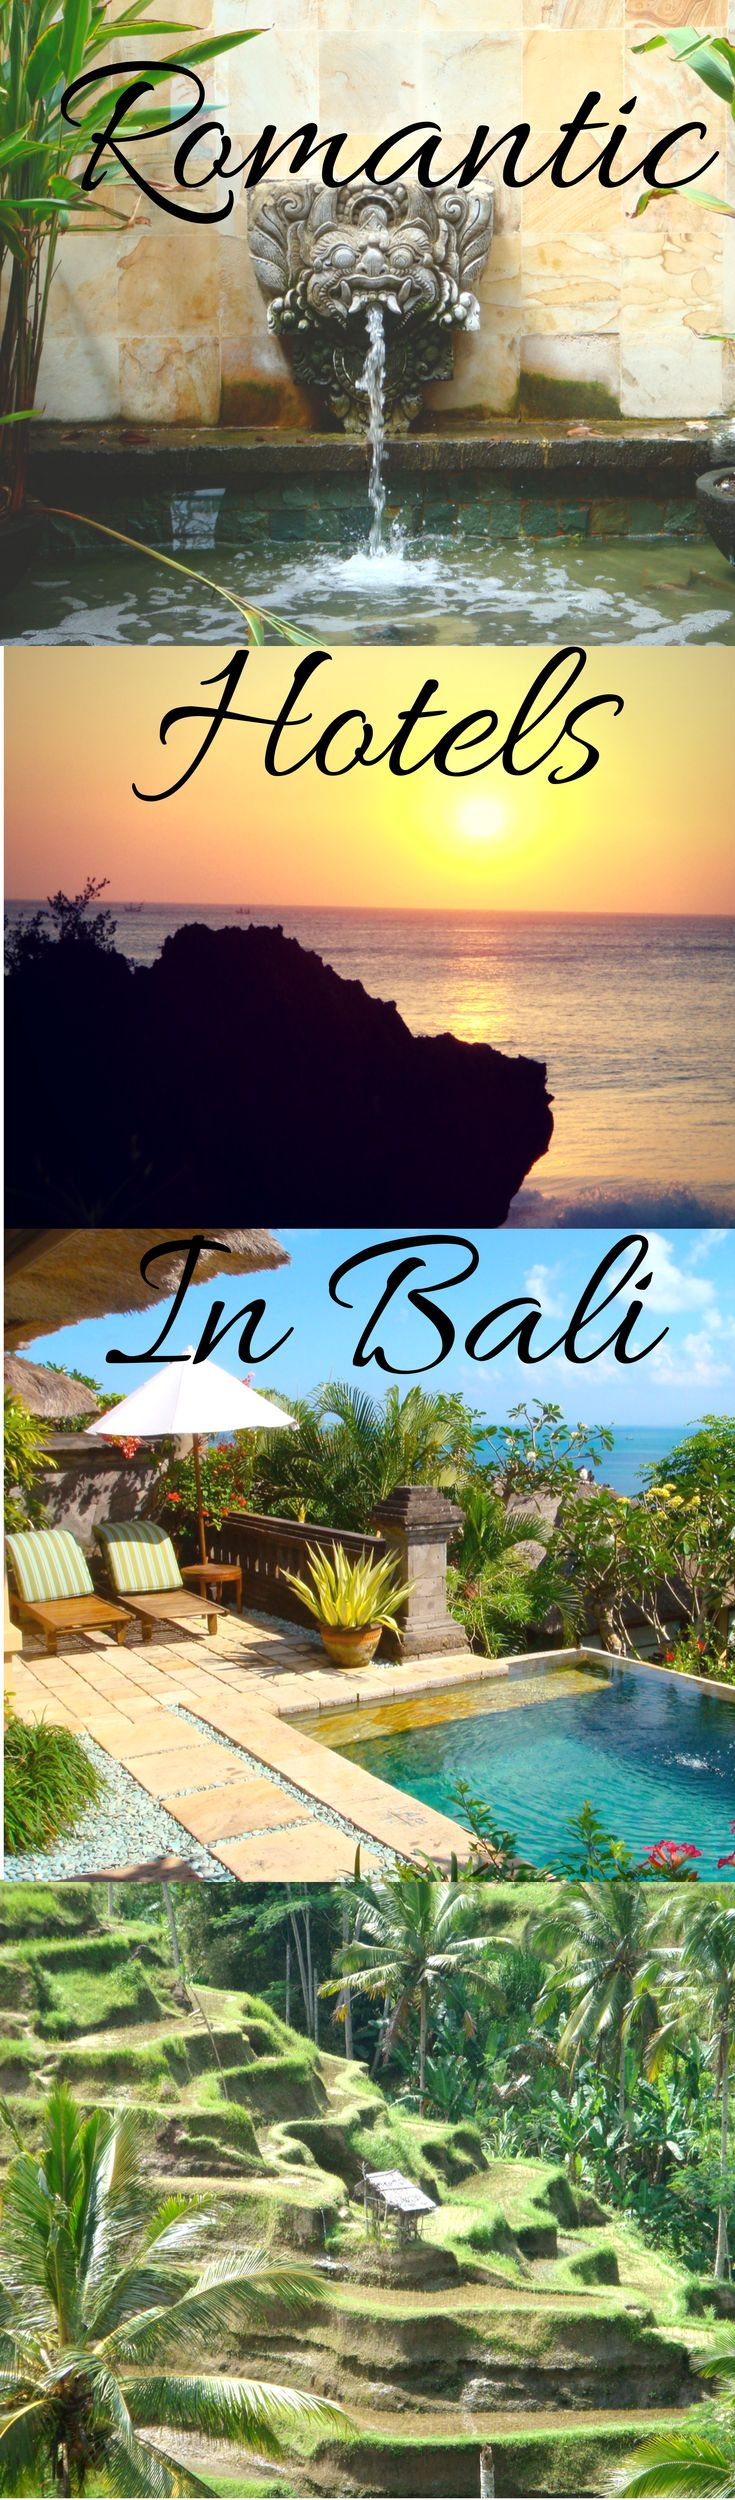 Best 25 romantic travel ideas on pinterest romantic for Ideas for a romantic getaway